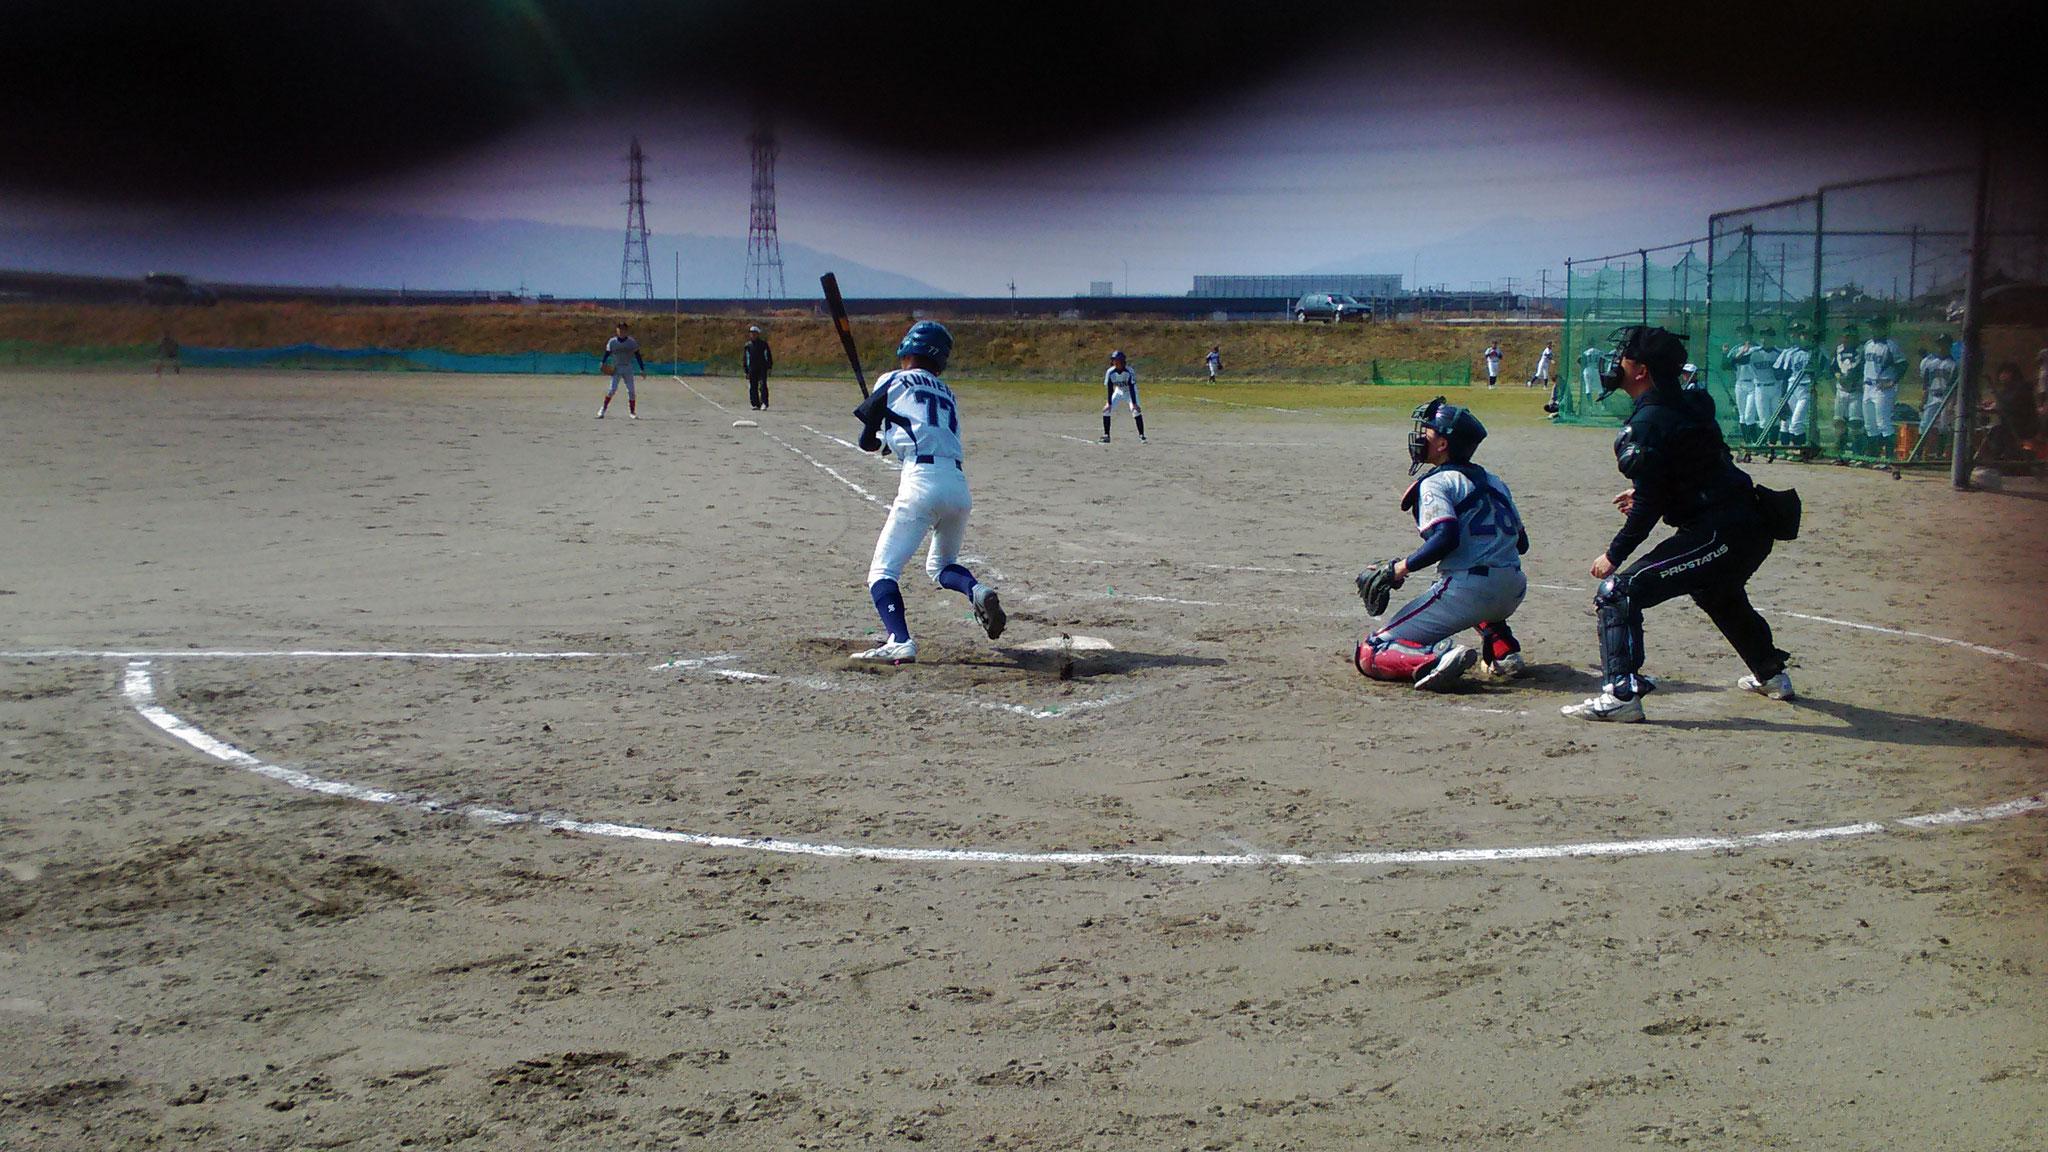 77 Kunieda Takenori